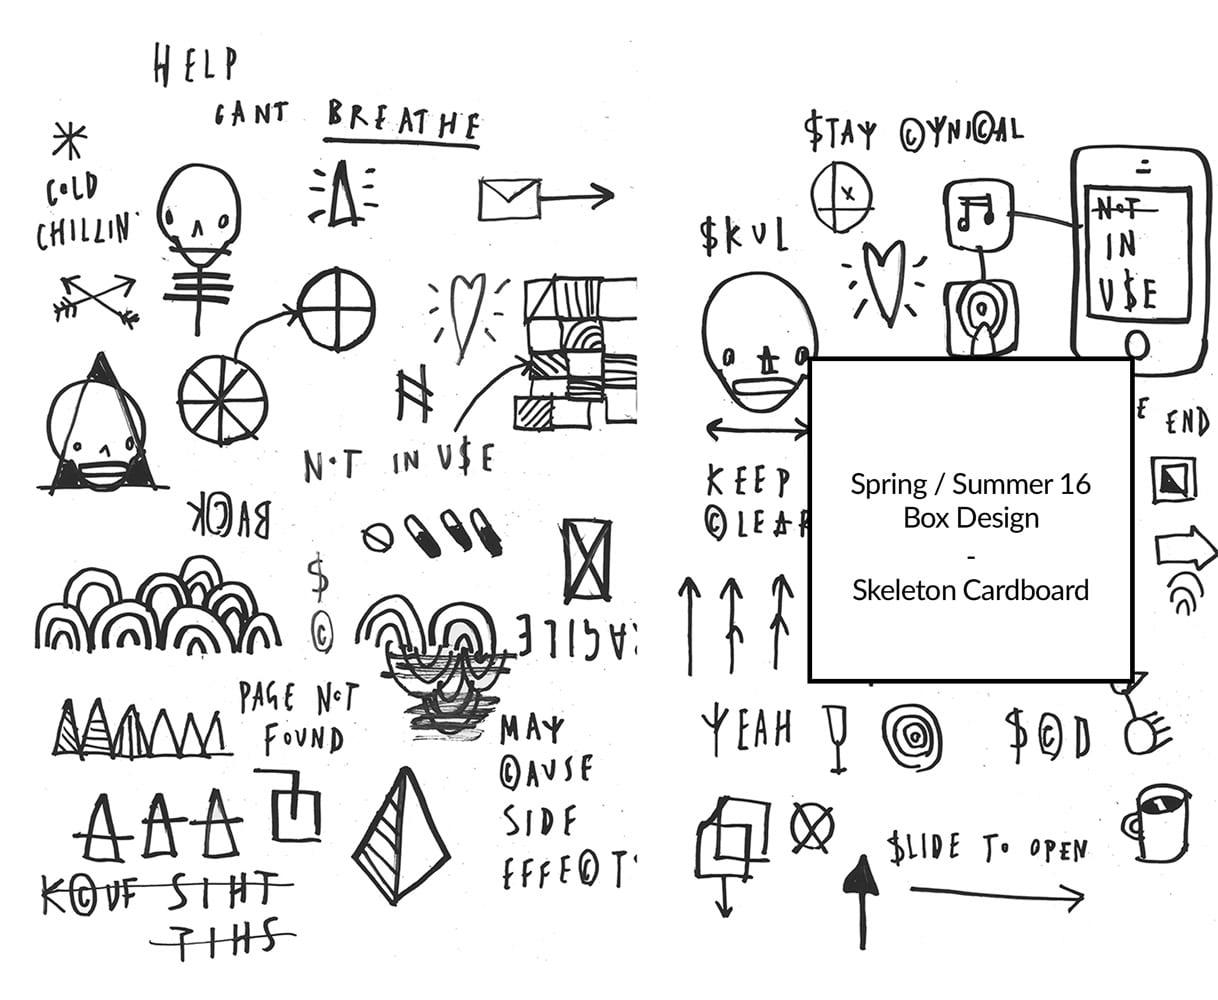 SS16 Box Design by Skeleton Cardboard